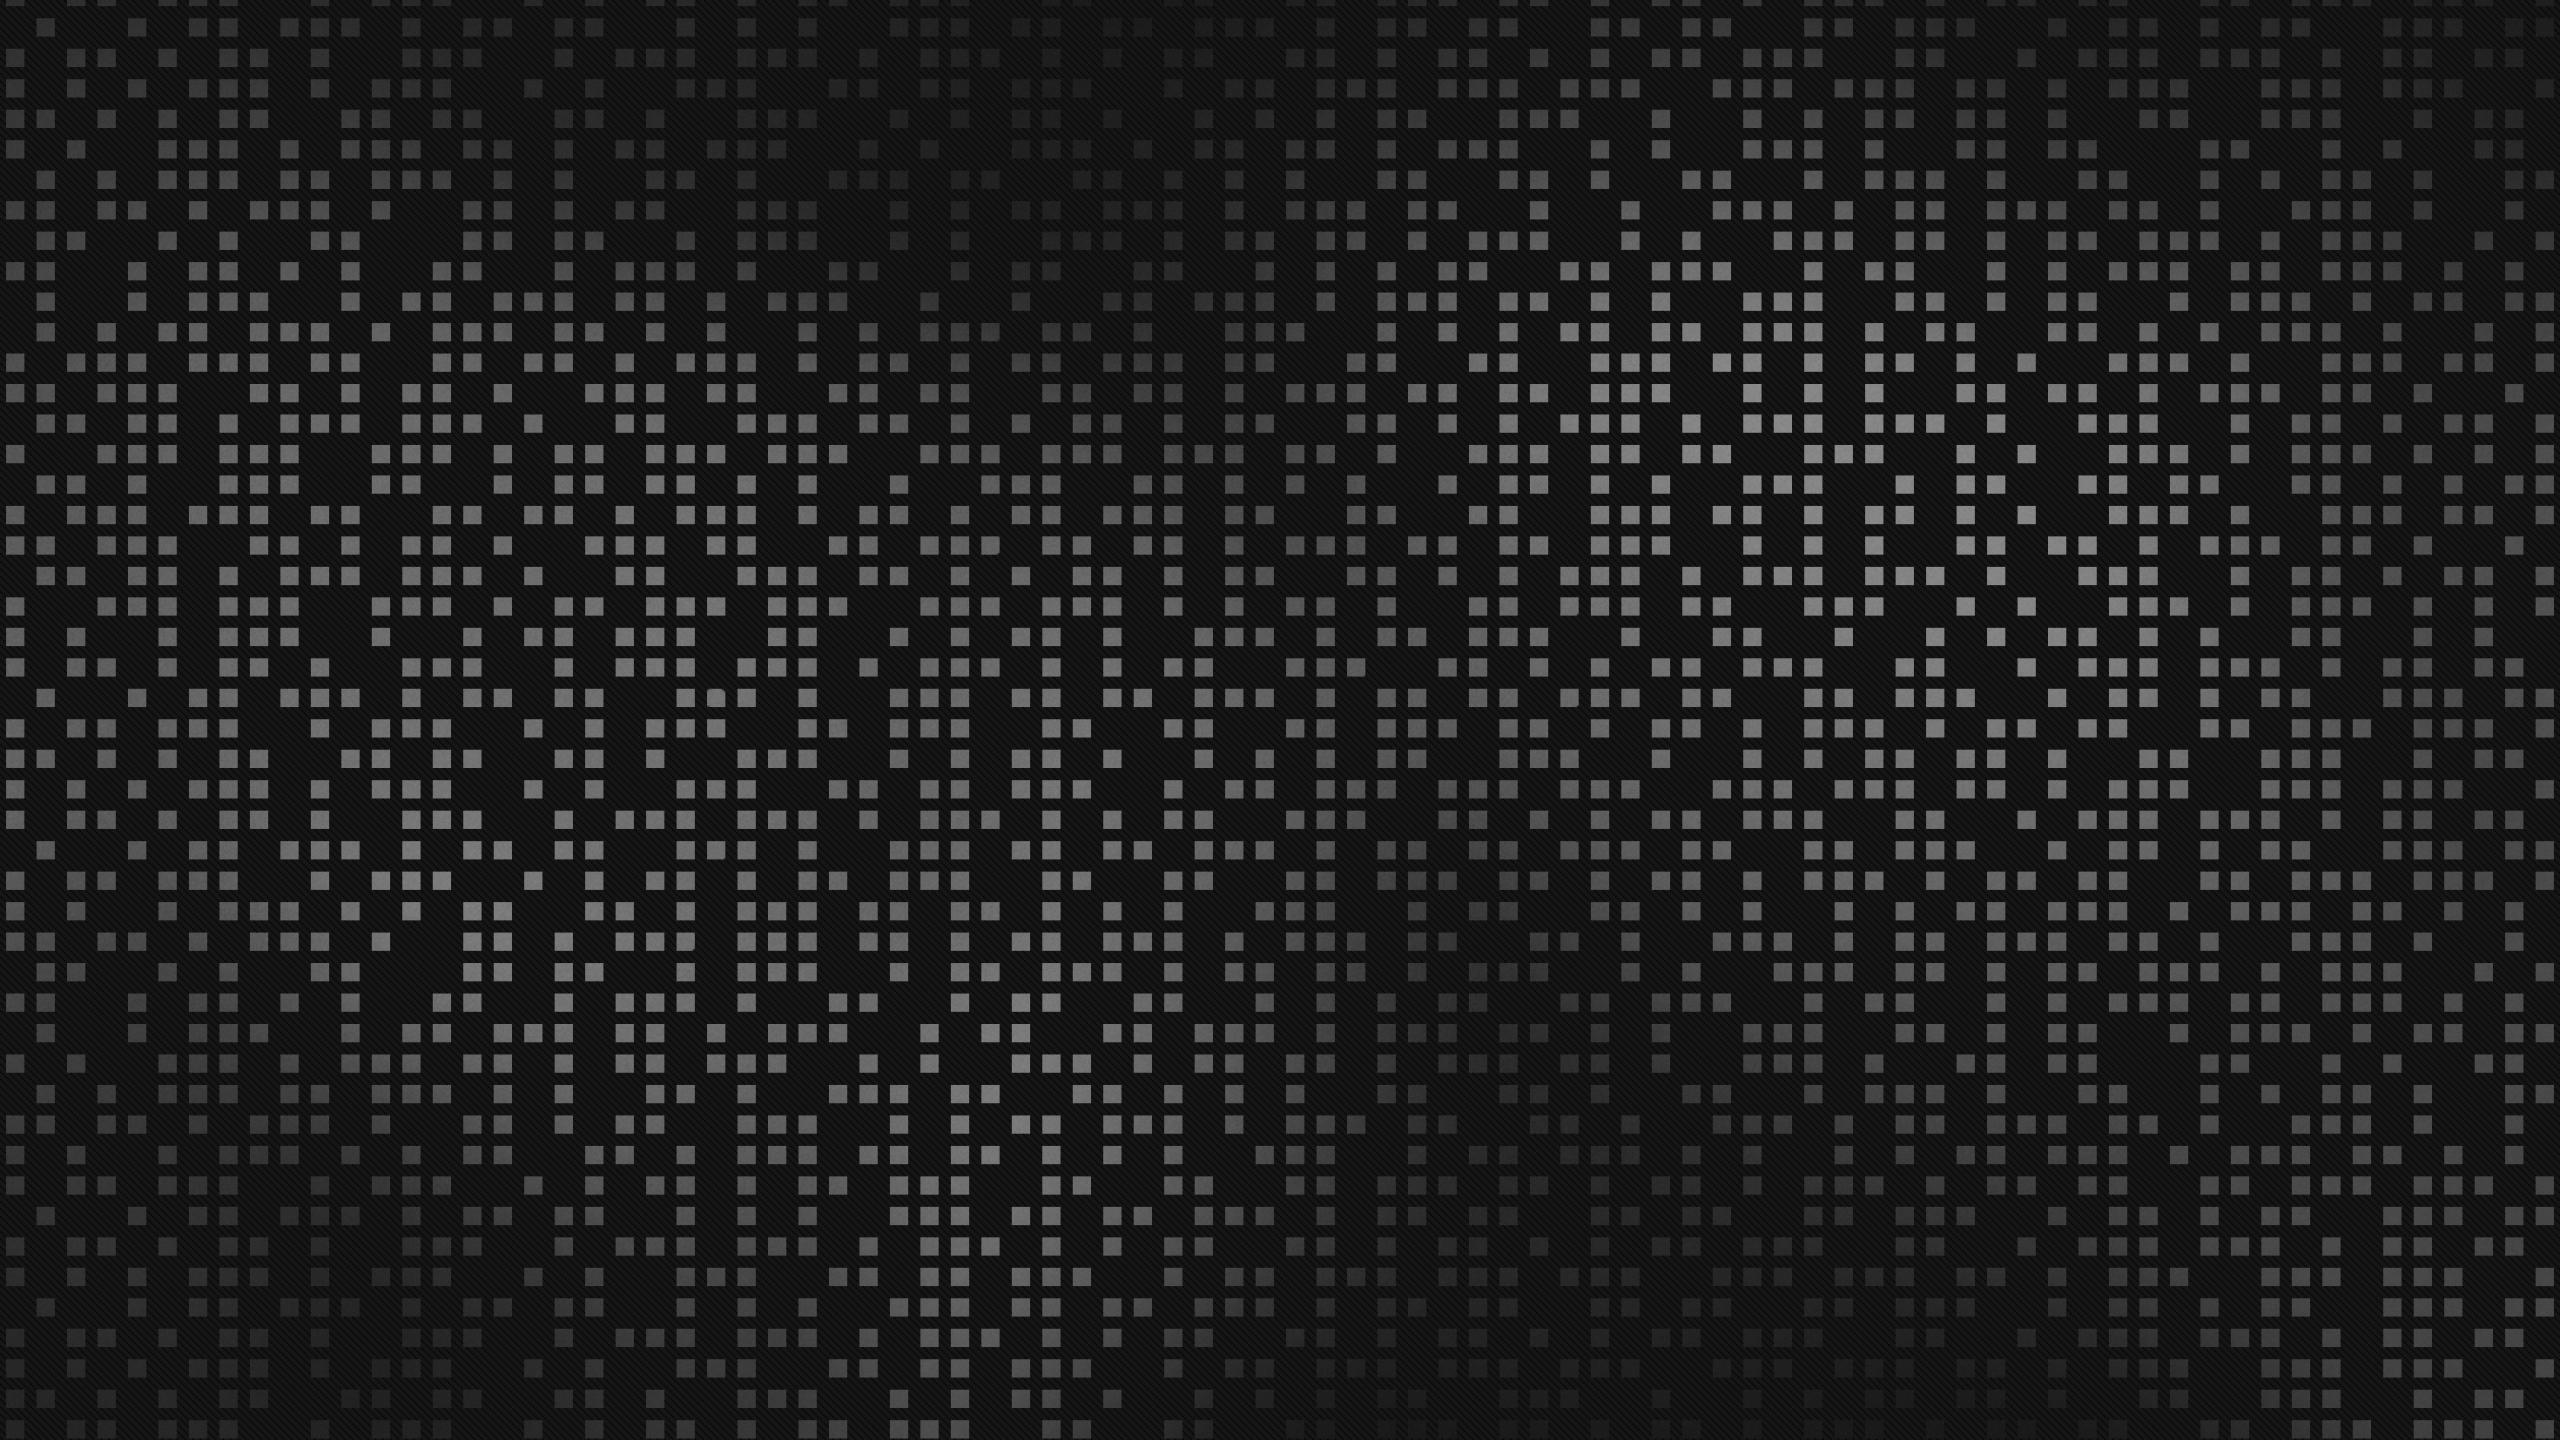 46 2560 x 1440 phone wallpaper on wallpapersafari for Sfondi 2560x1440